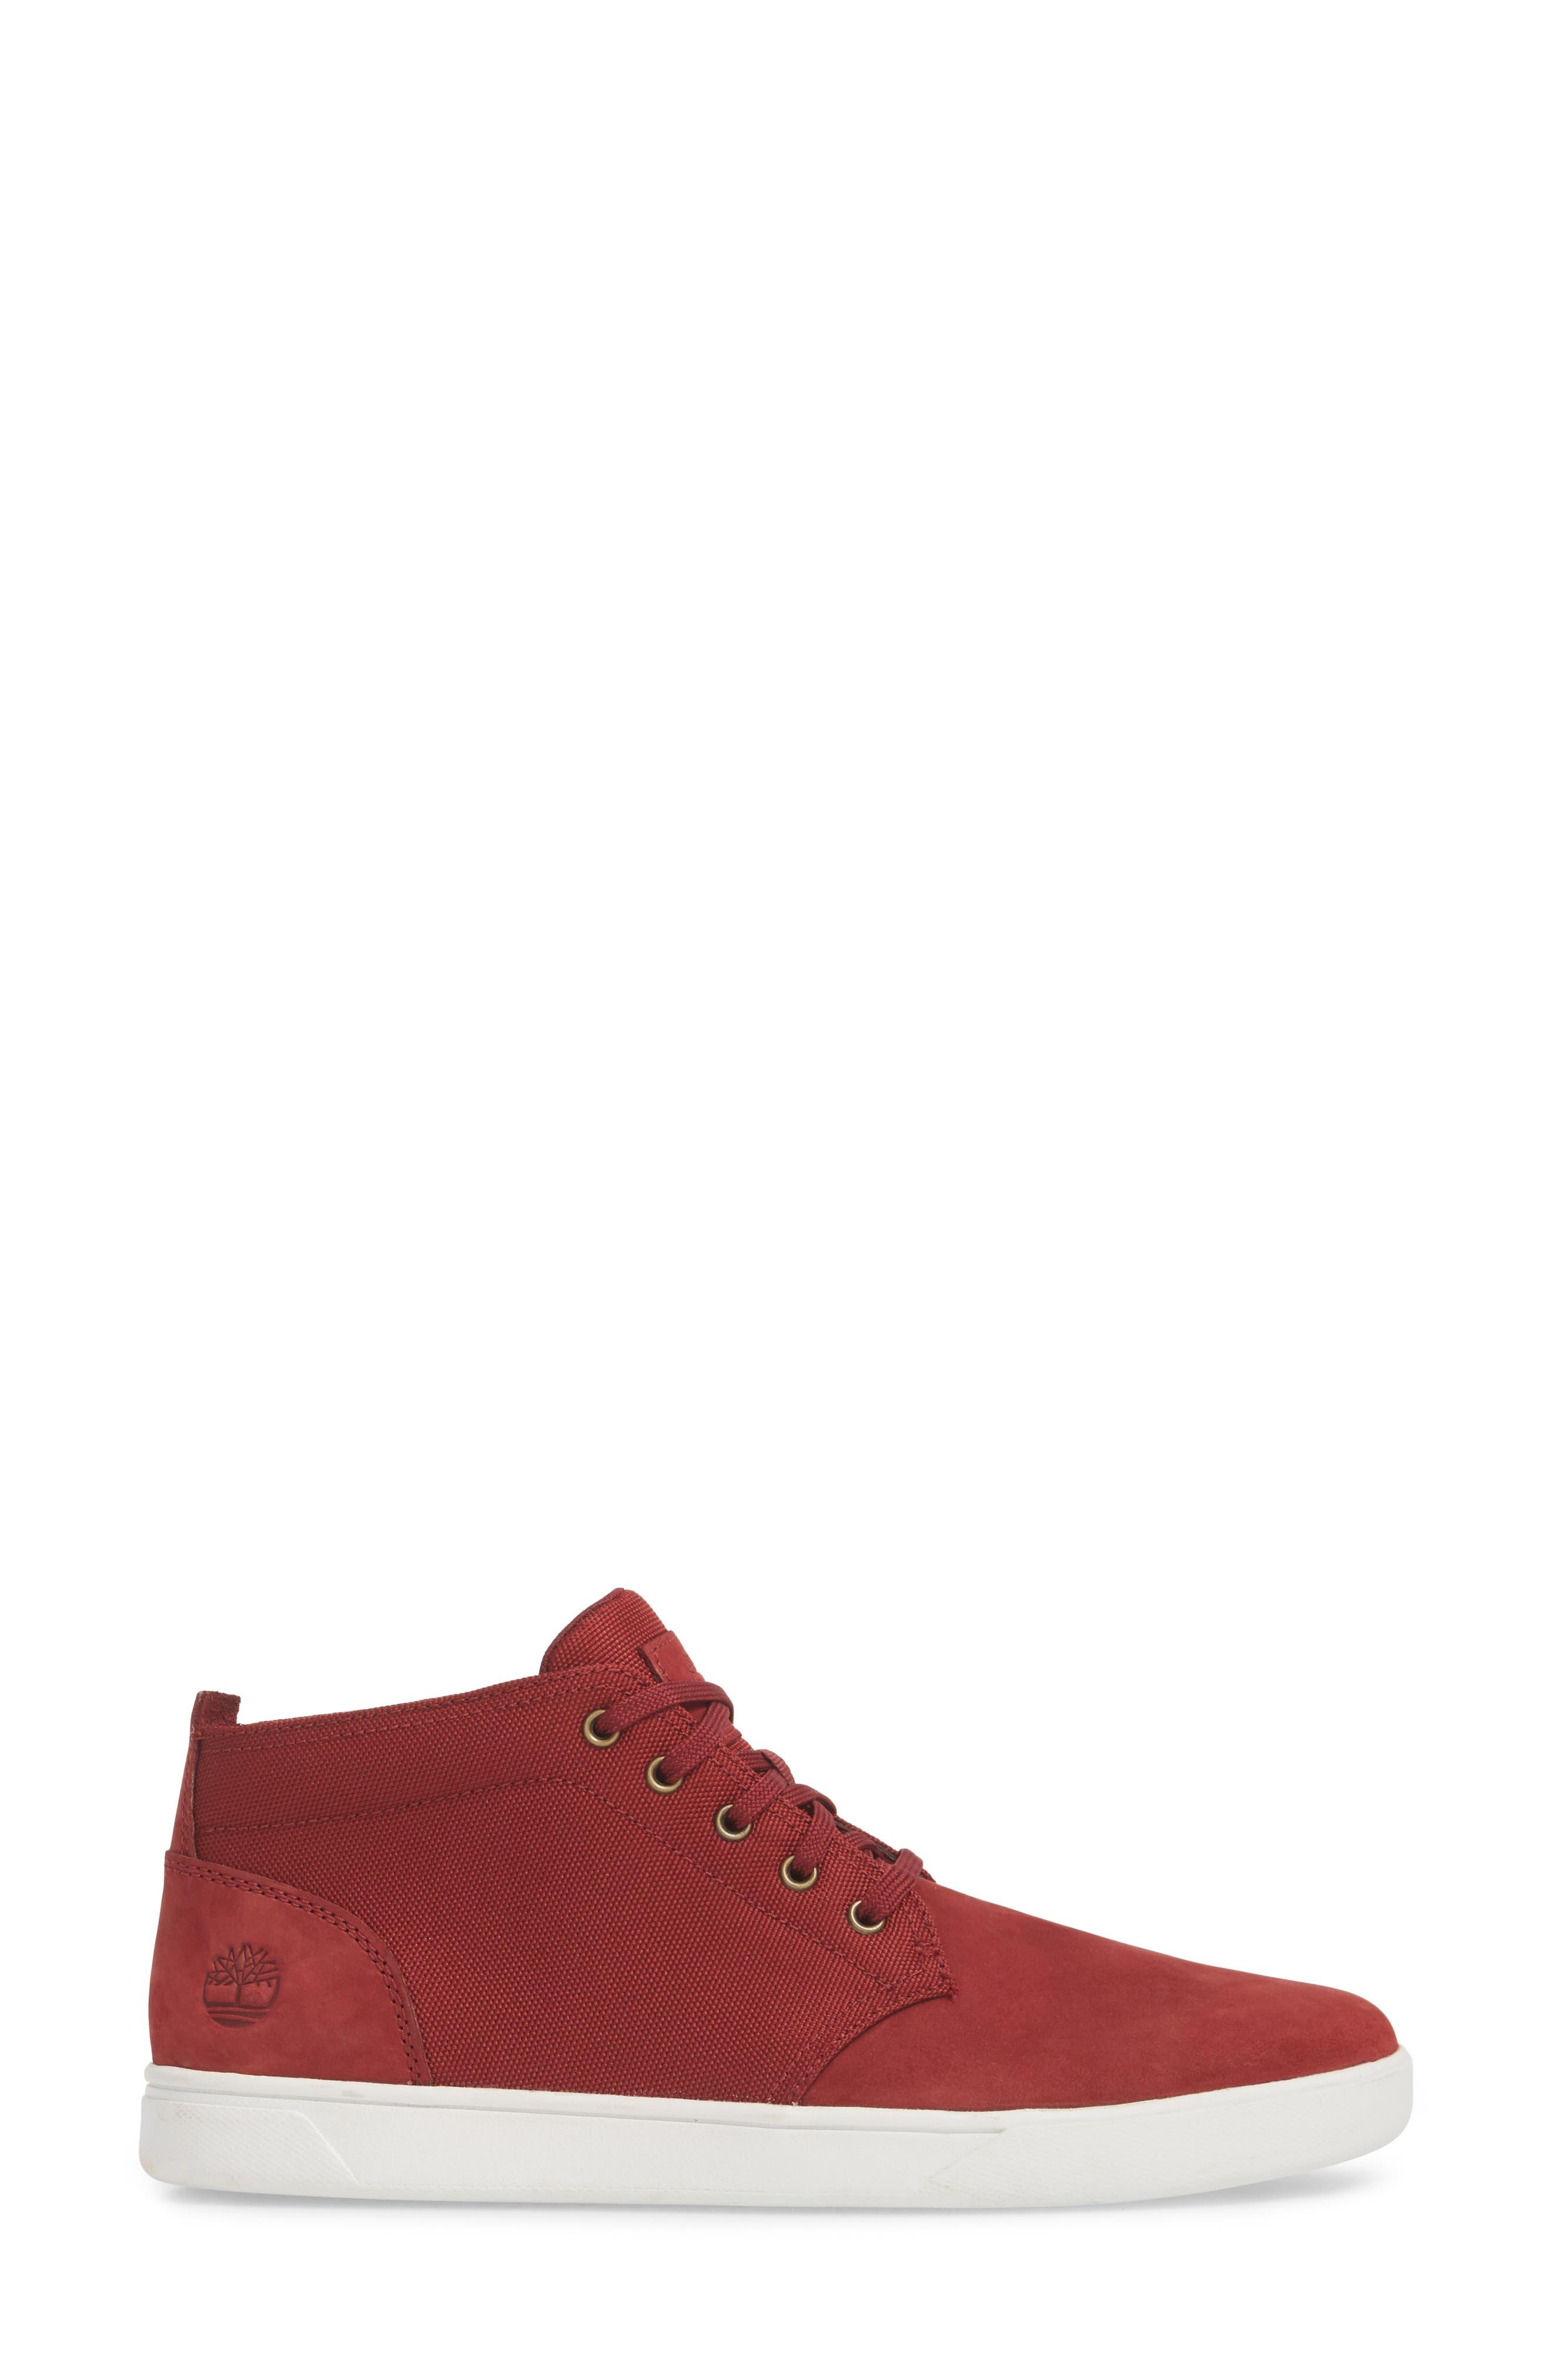 Earthkeepers<sup>™</sup> 'Groveton' Chukka Sneaker,                             Alternate thumbnail 3, color,                             POMEGRANATE NUBUCK